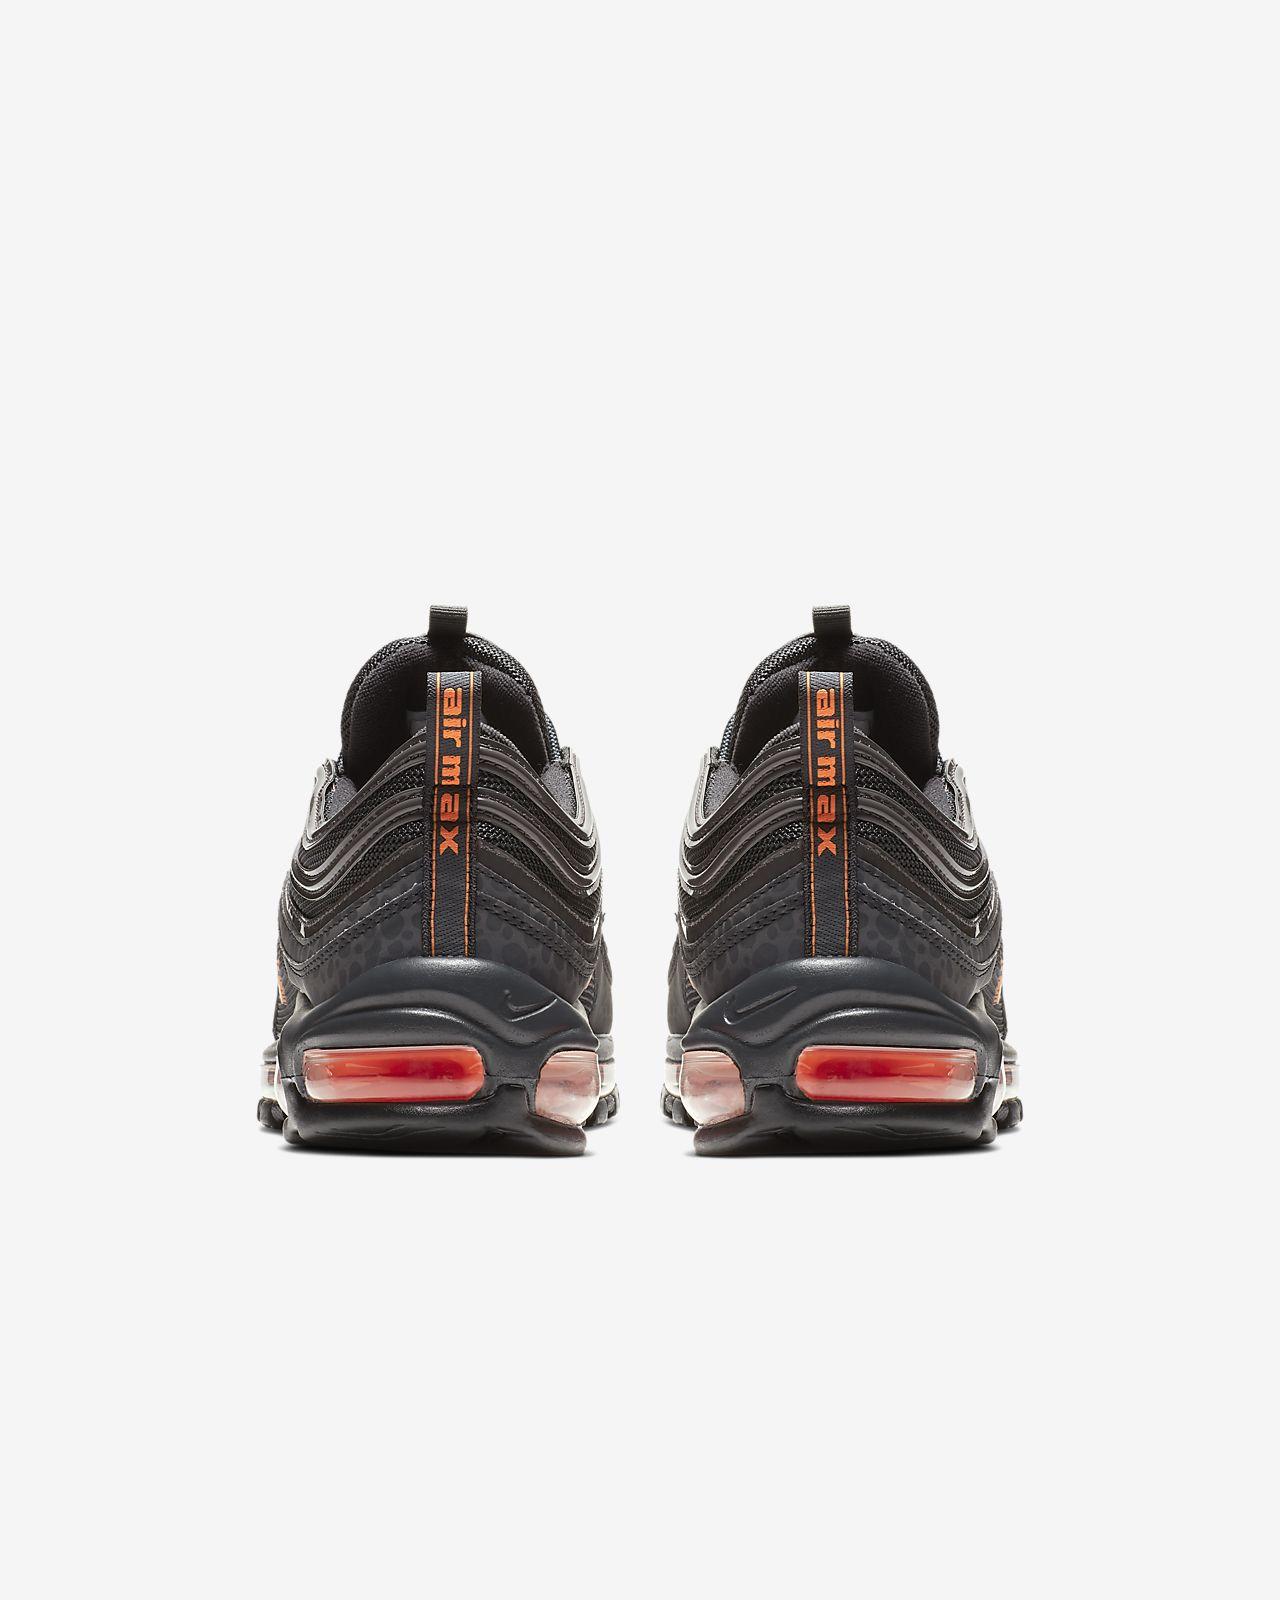 hot sale online 53a23 0b342 ... Nike Air Max 97 SE Reflective Men s Shoe